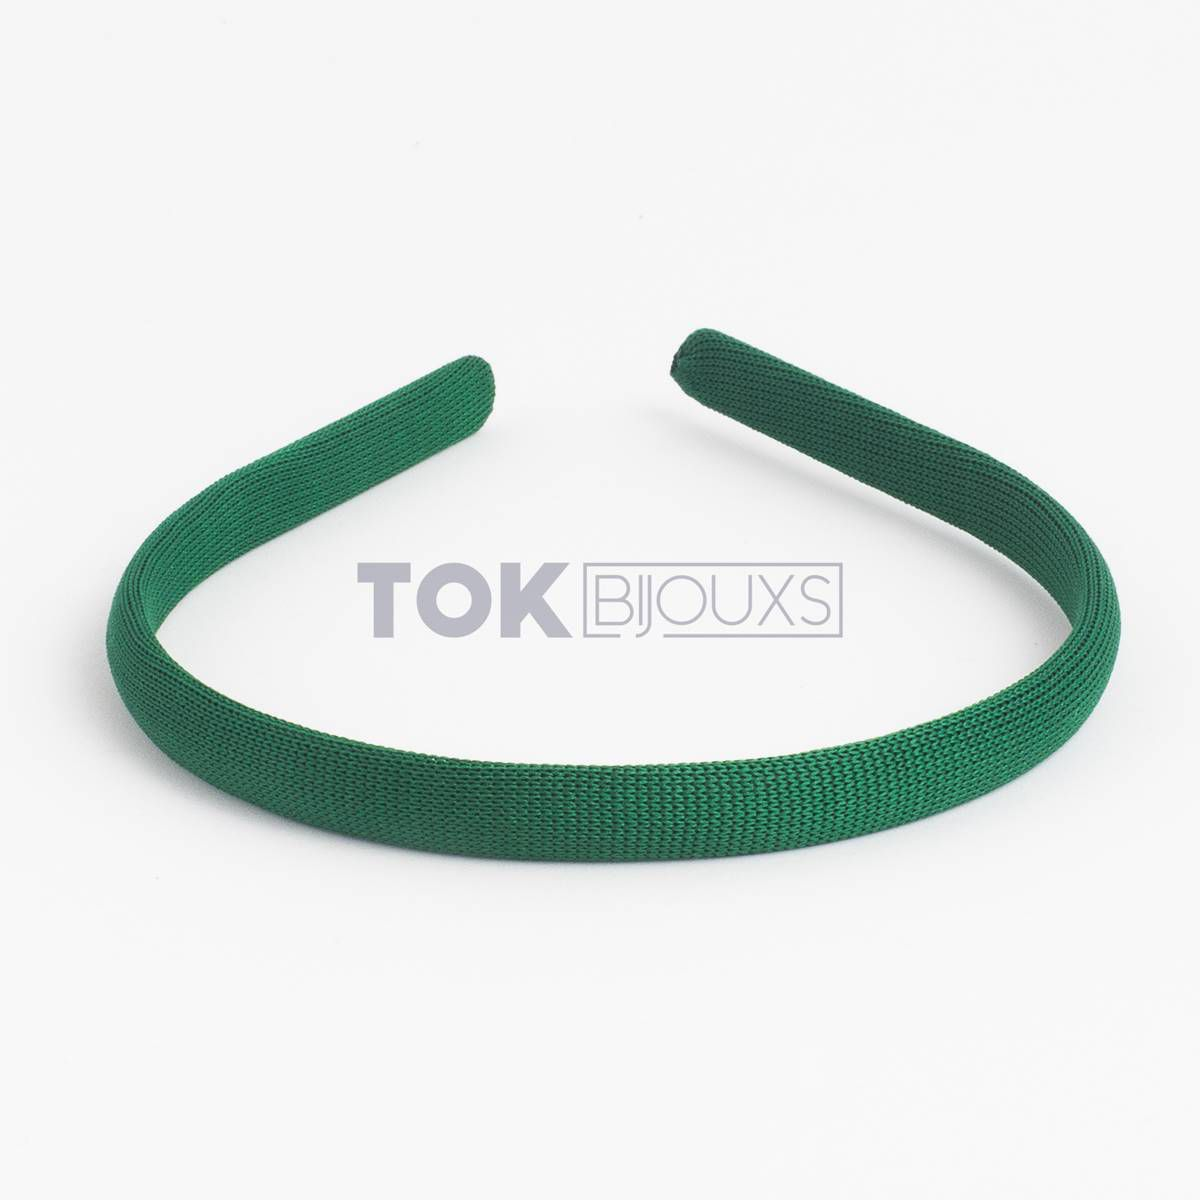 Tiaras Encapadas 10mm - Verde Bandeira - 12  Unid